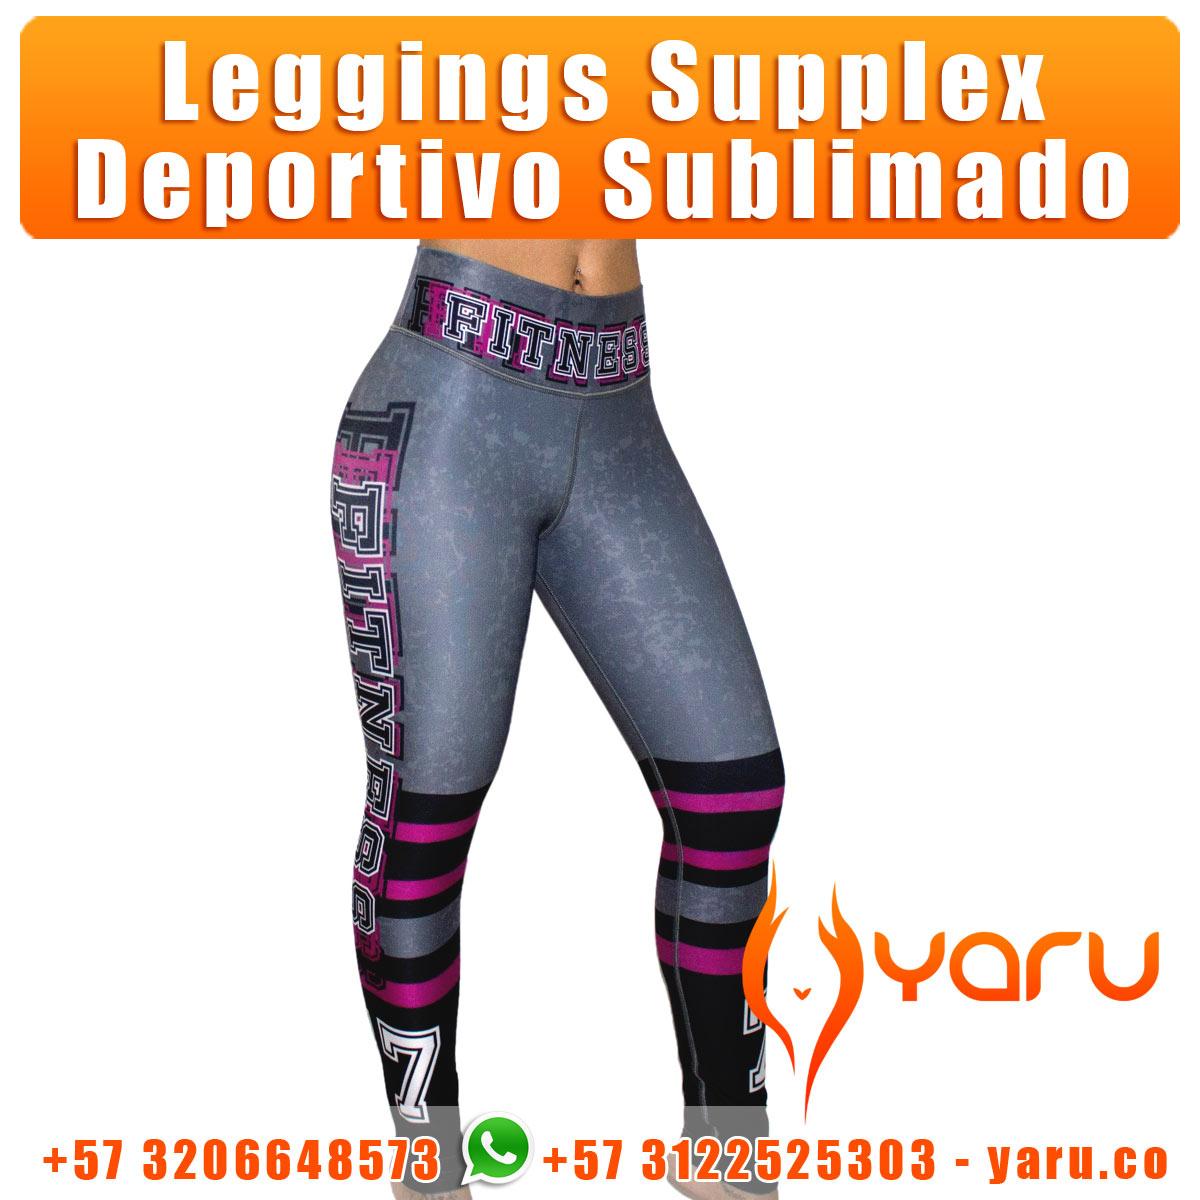 YARU Colombian Sportswear manufacturer leggings supplex tops shorts